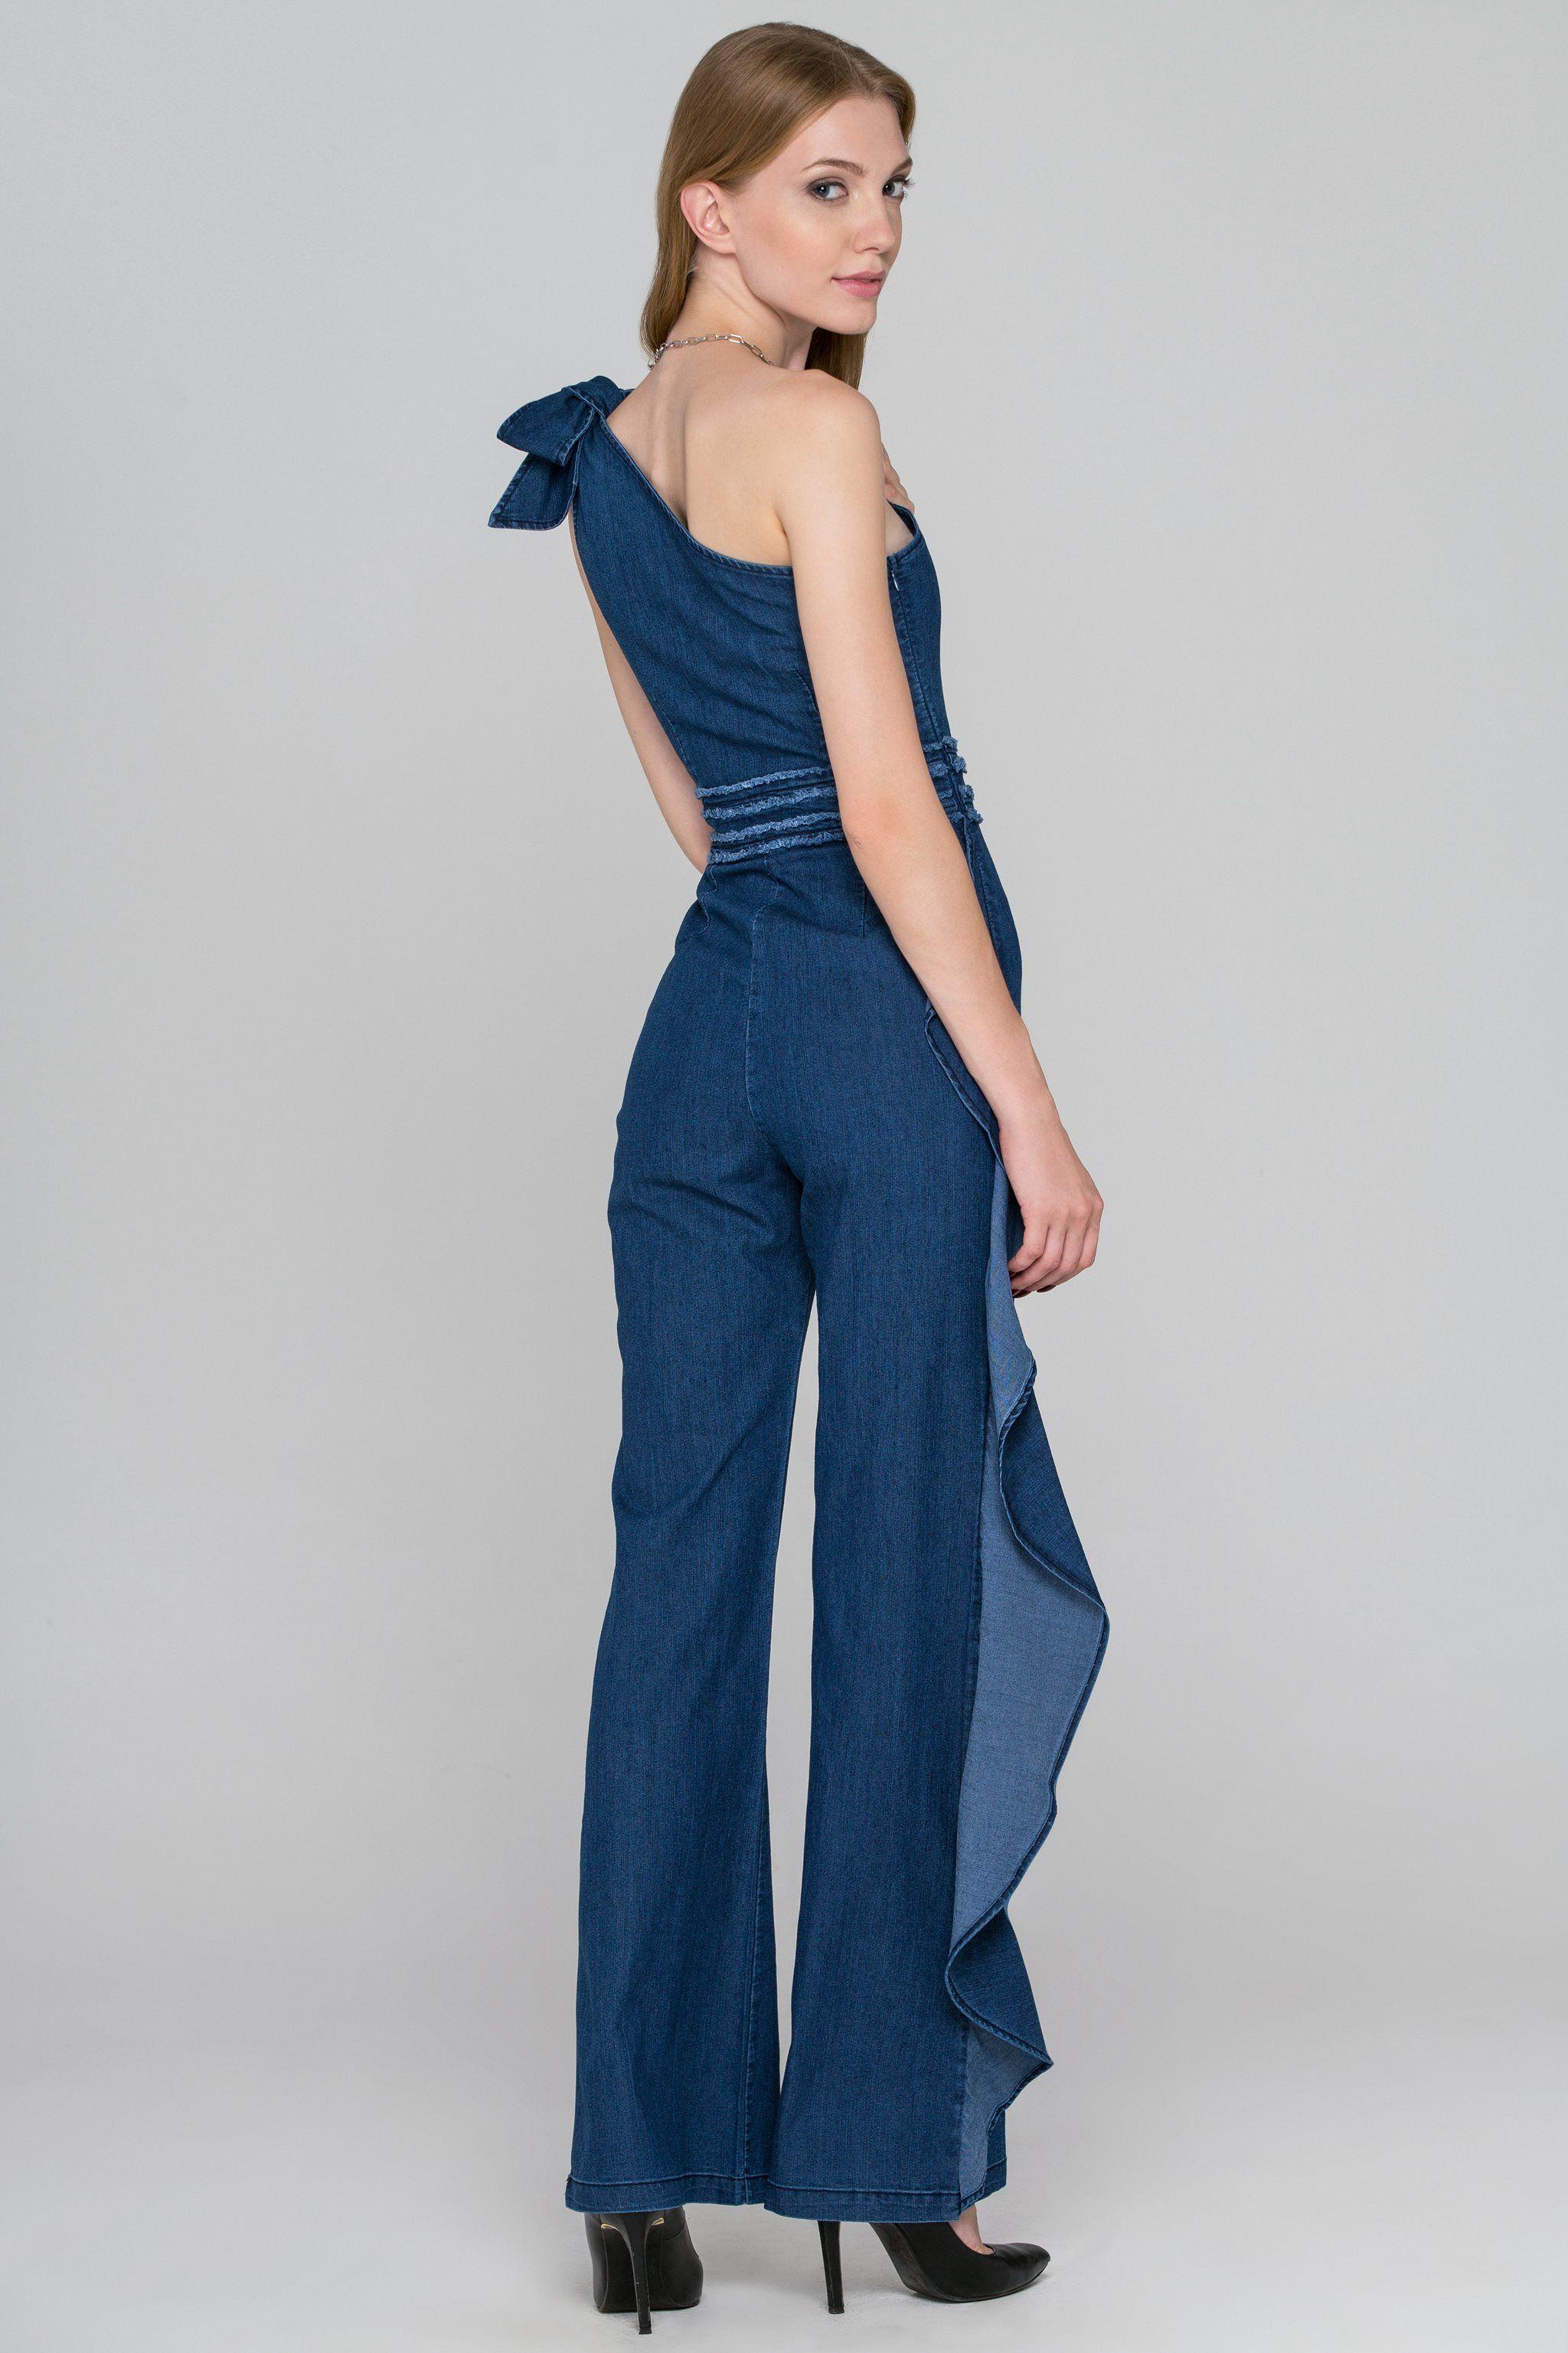 f57435a55696 One Shoulder Ruffled Leg Denim Jumpsuit - (Price   120.00)  fashionstyle   fashionweek  fashionable  stores  style  shopping  dressesonline  dress   womens ...